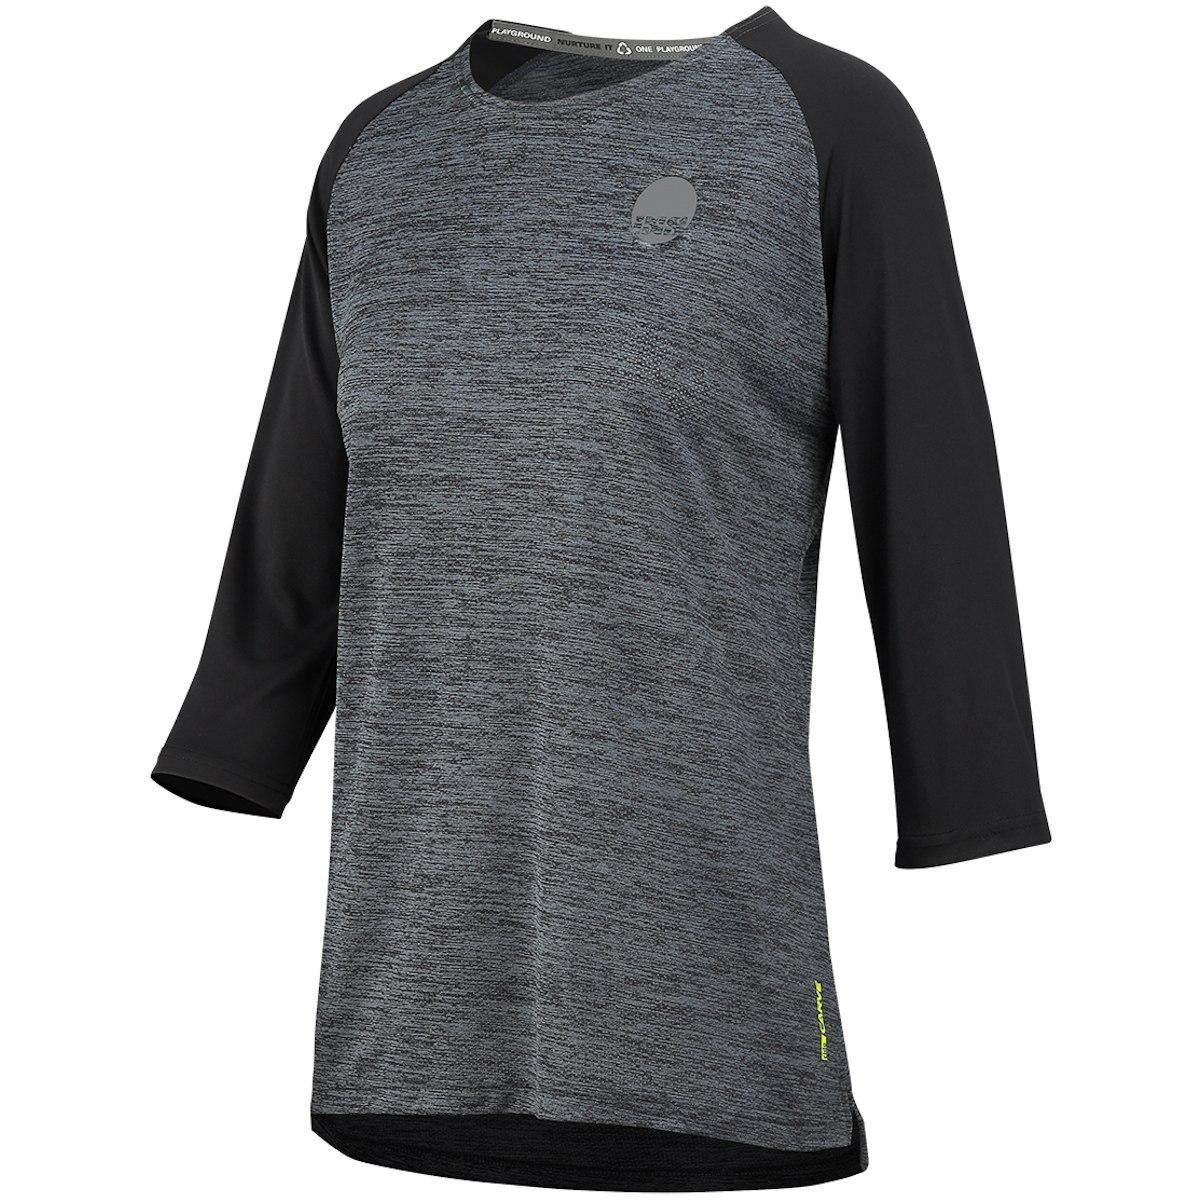 iXS Carve X Women Jersey 3/4 Sleeves - graphite/black